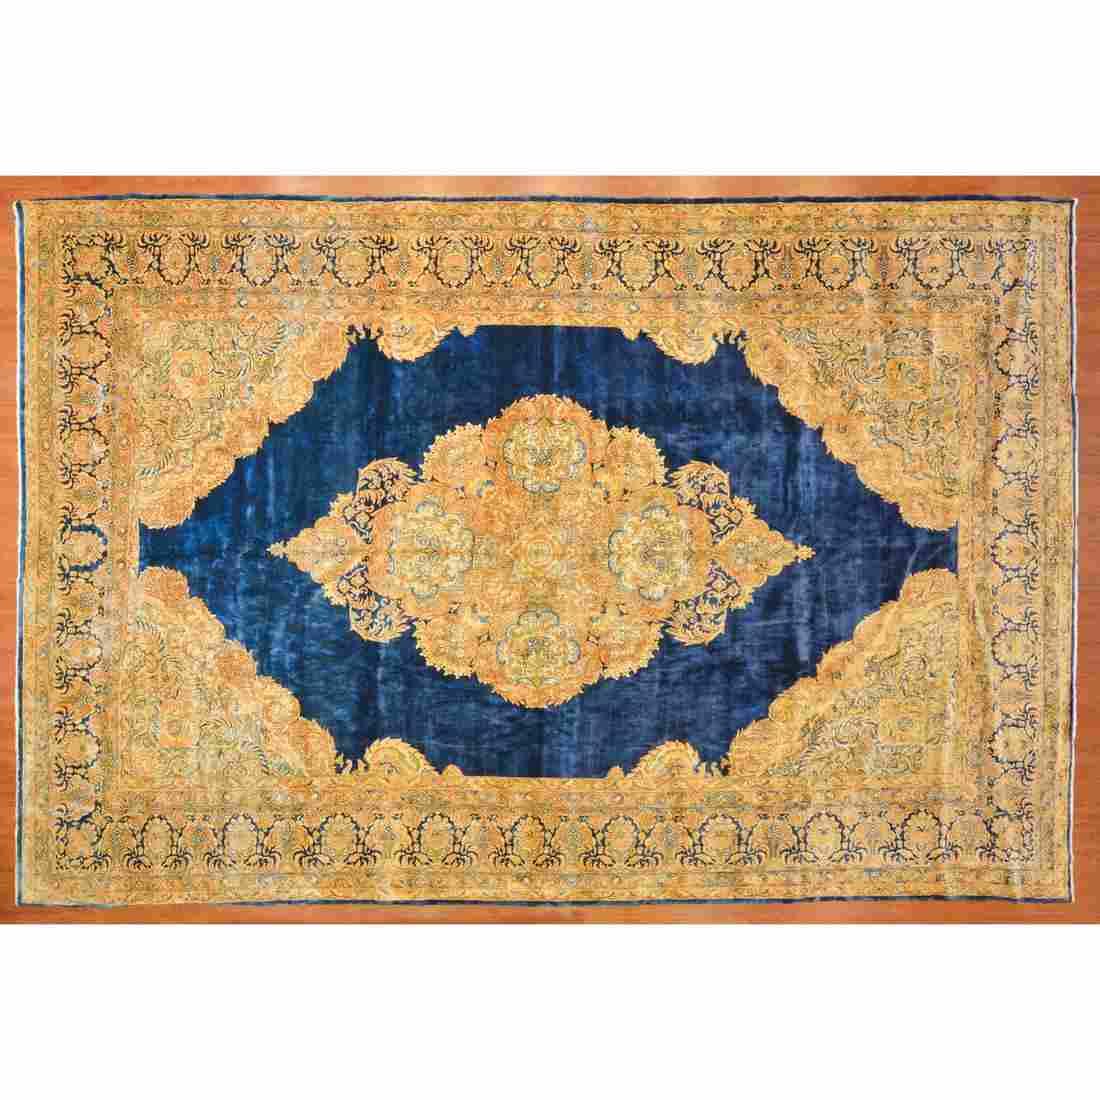 Semi-Antique Kerman Carpet, Persia, 11 x 17